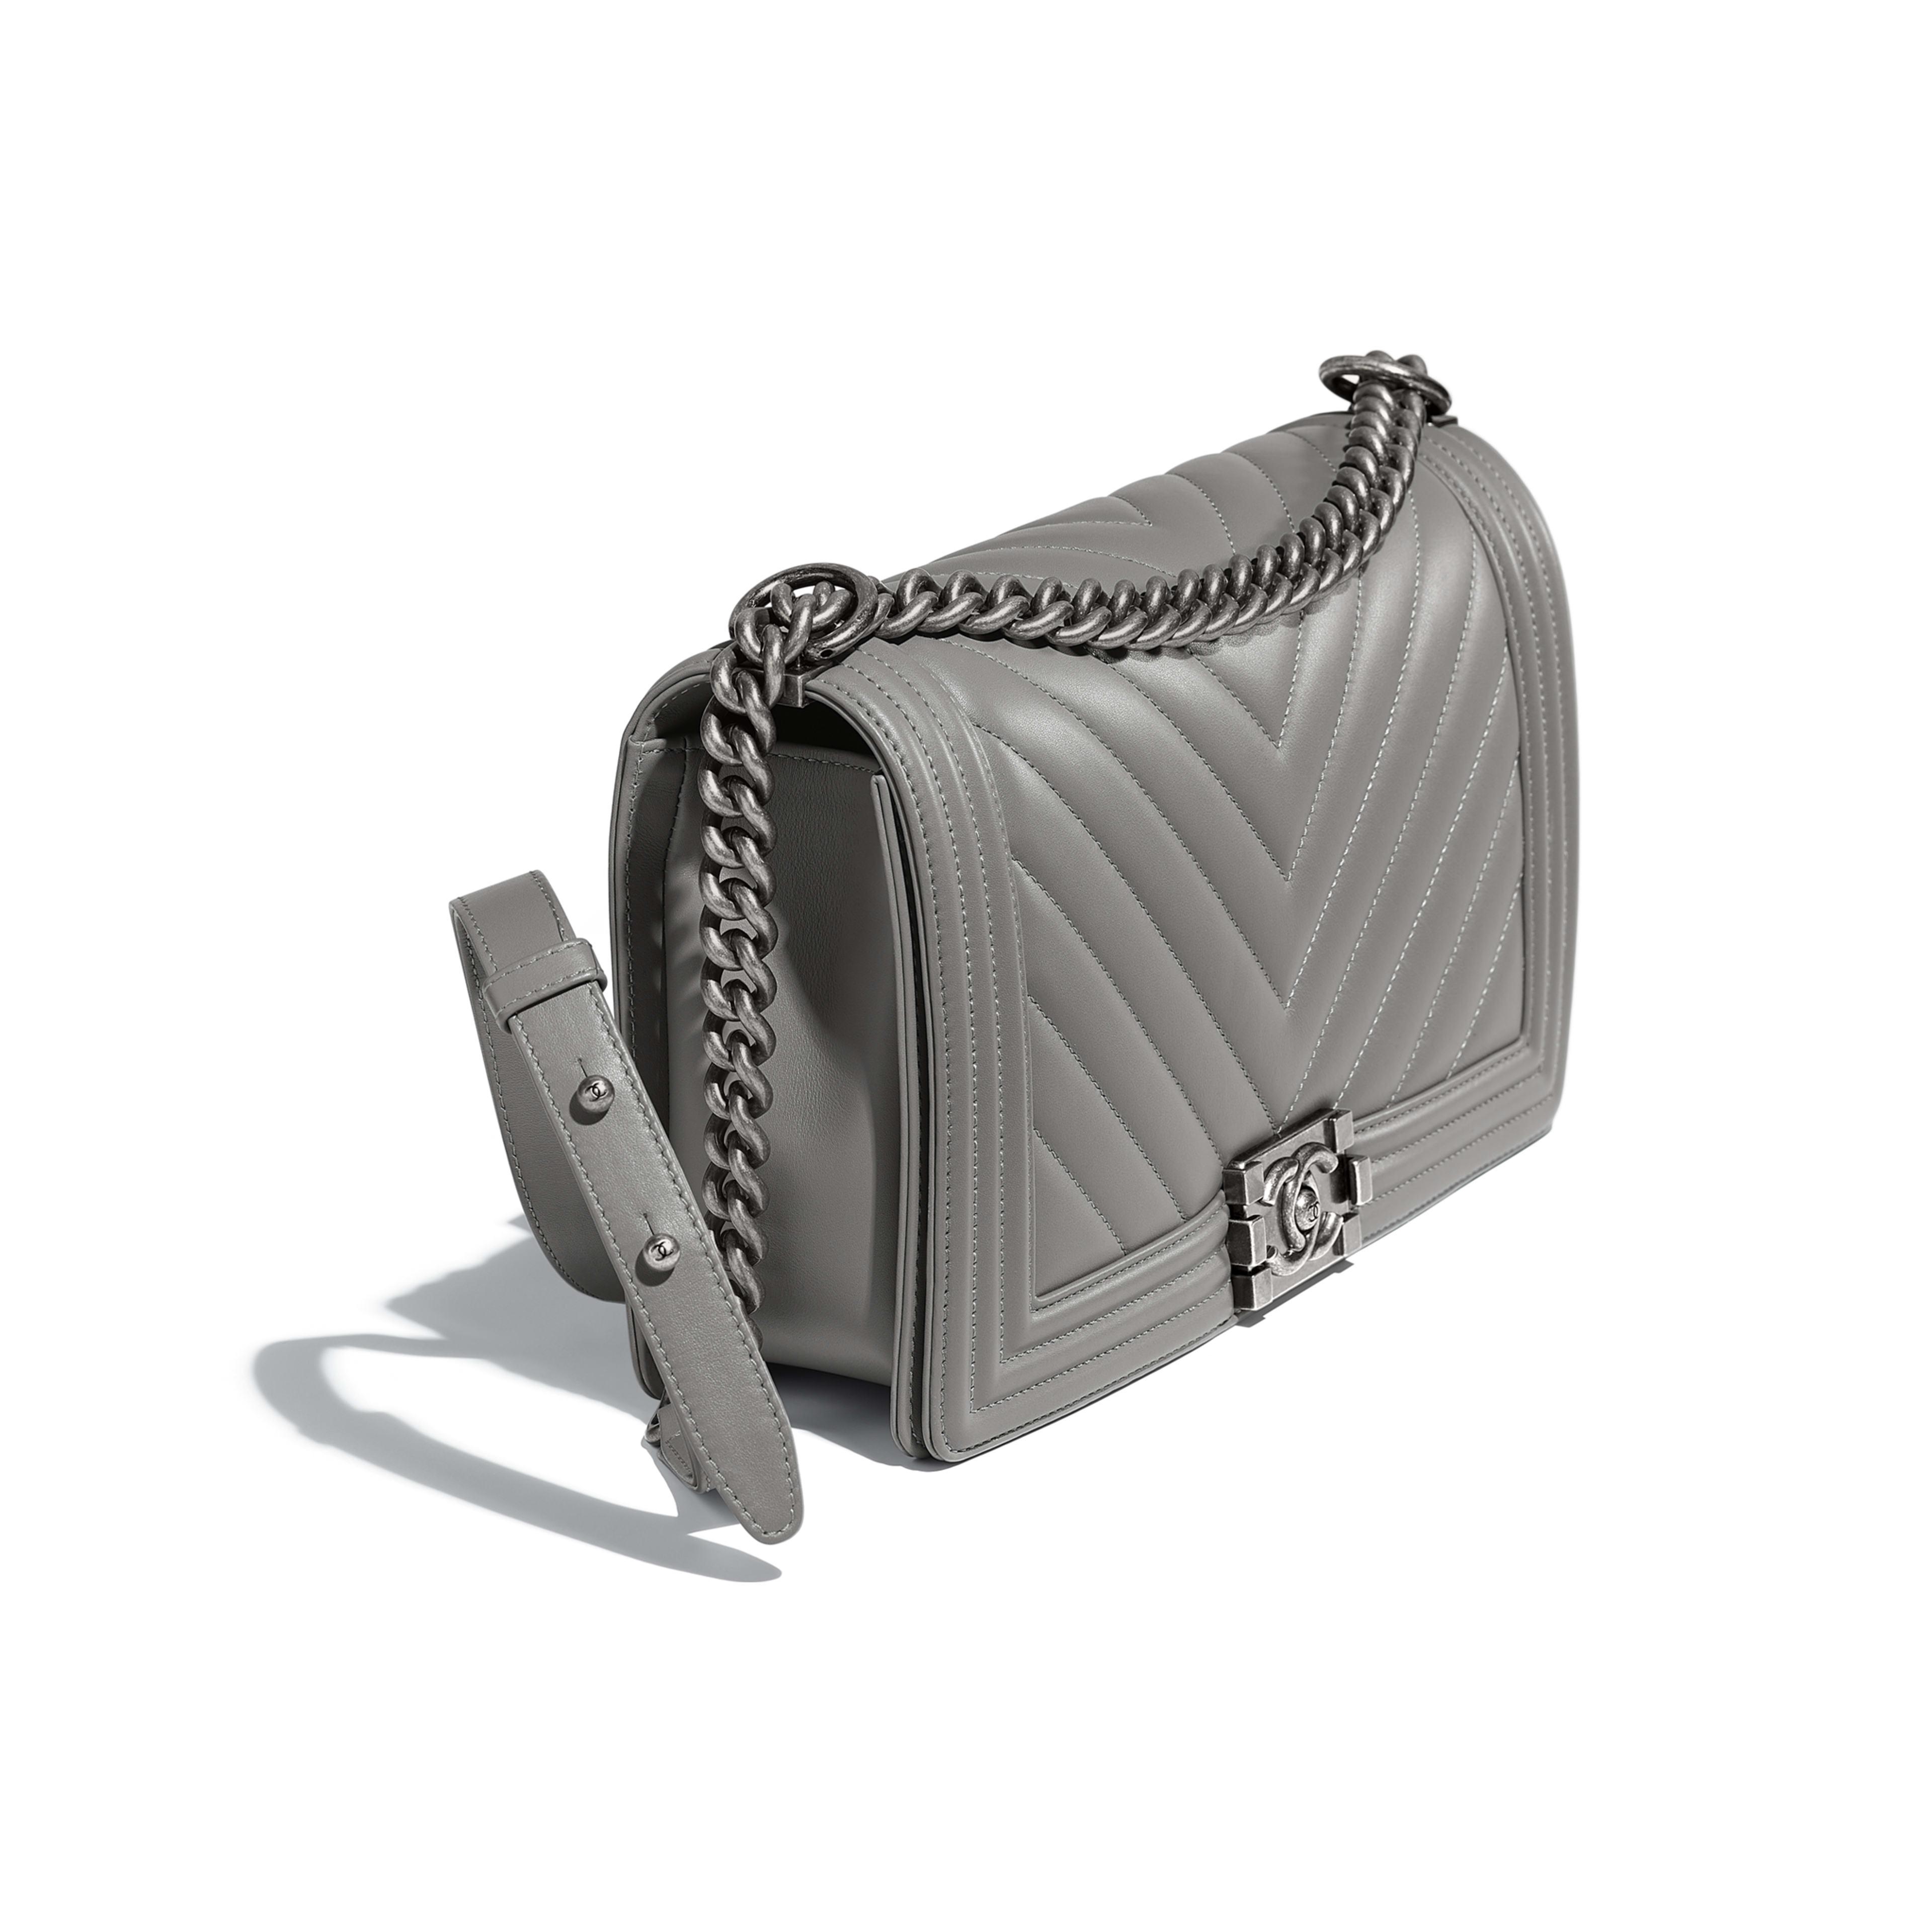 Large BOY CHANEL Handbag Calfskin & Ruthenium-Finish Metal Gray -                                            view 3 - see full sized version